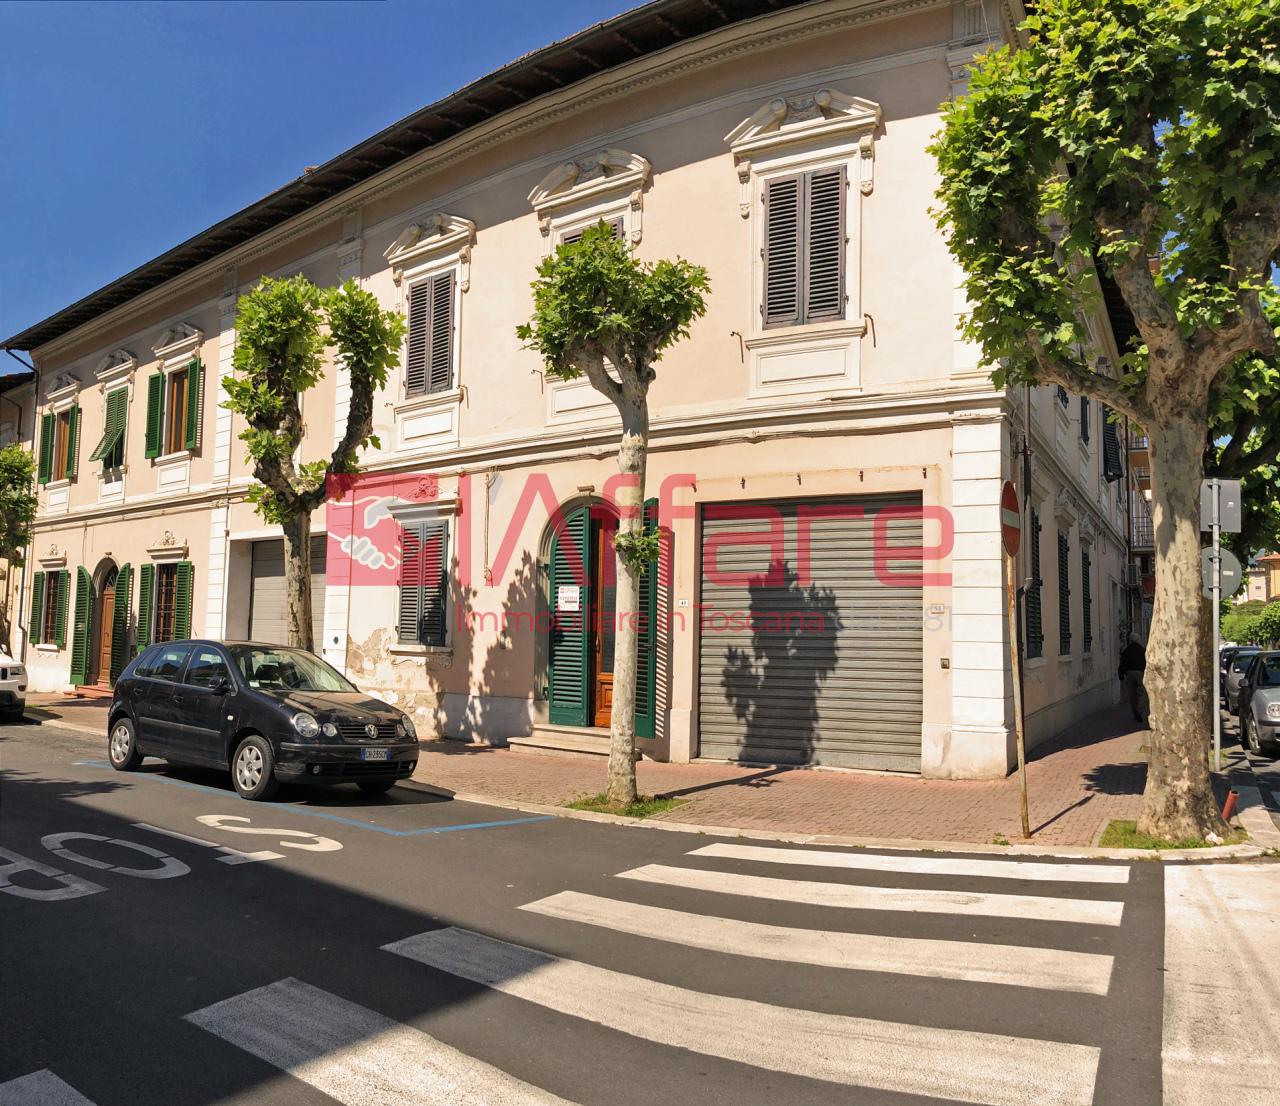 Montecatini-Terme (3/5)